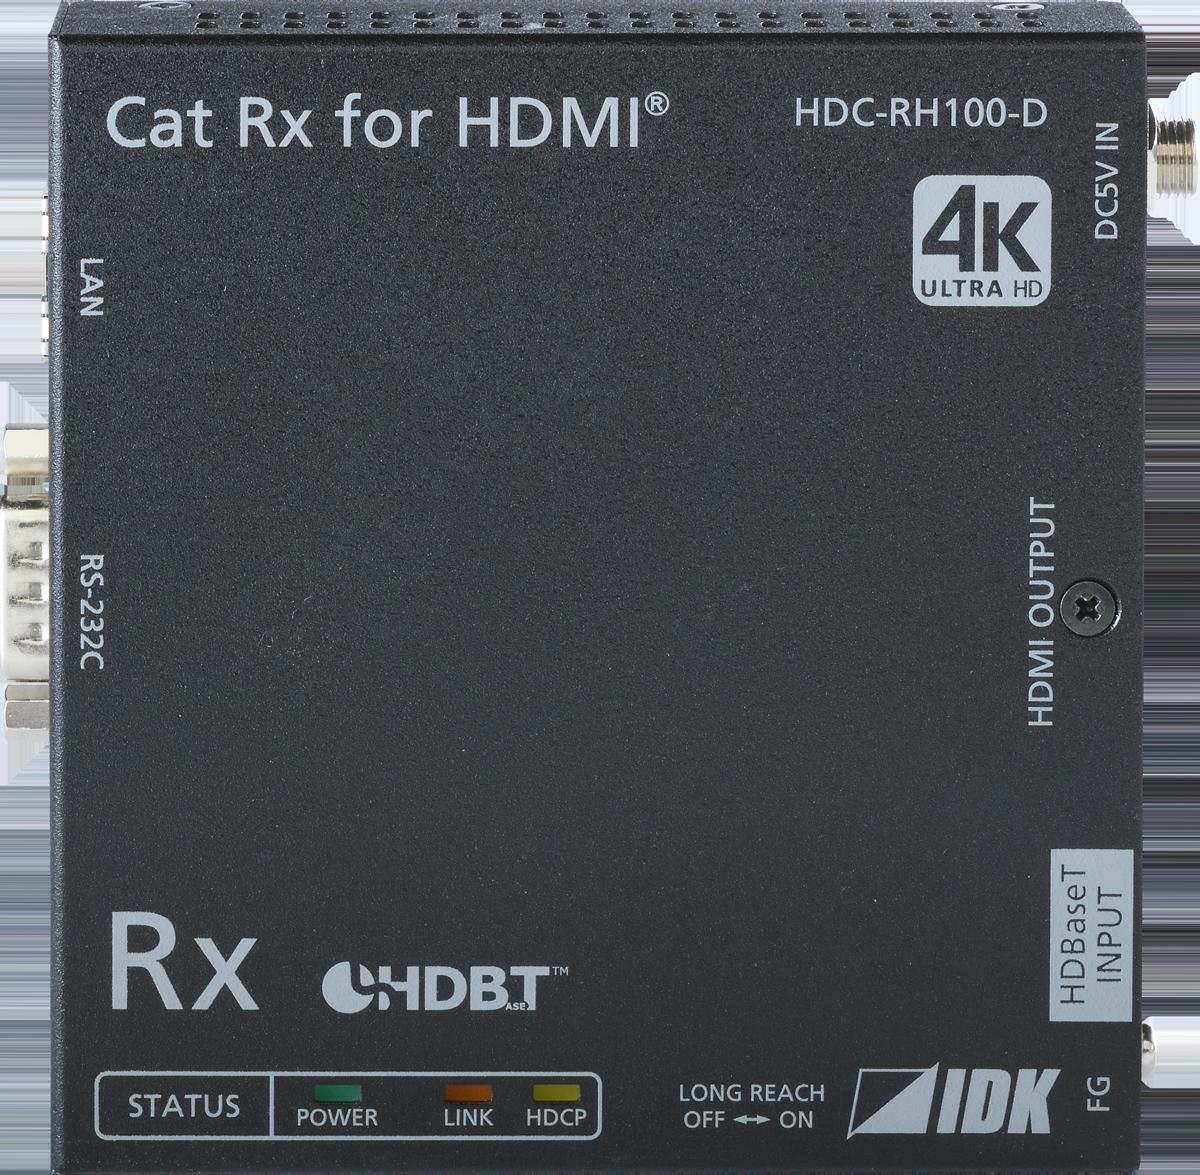 HDC-RH100-D